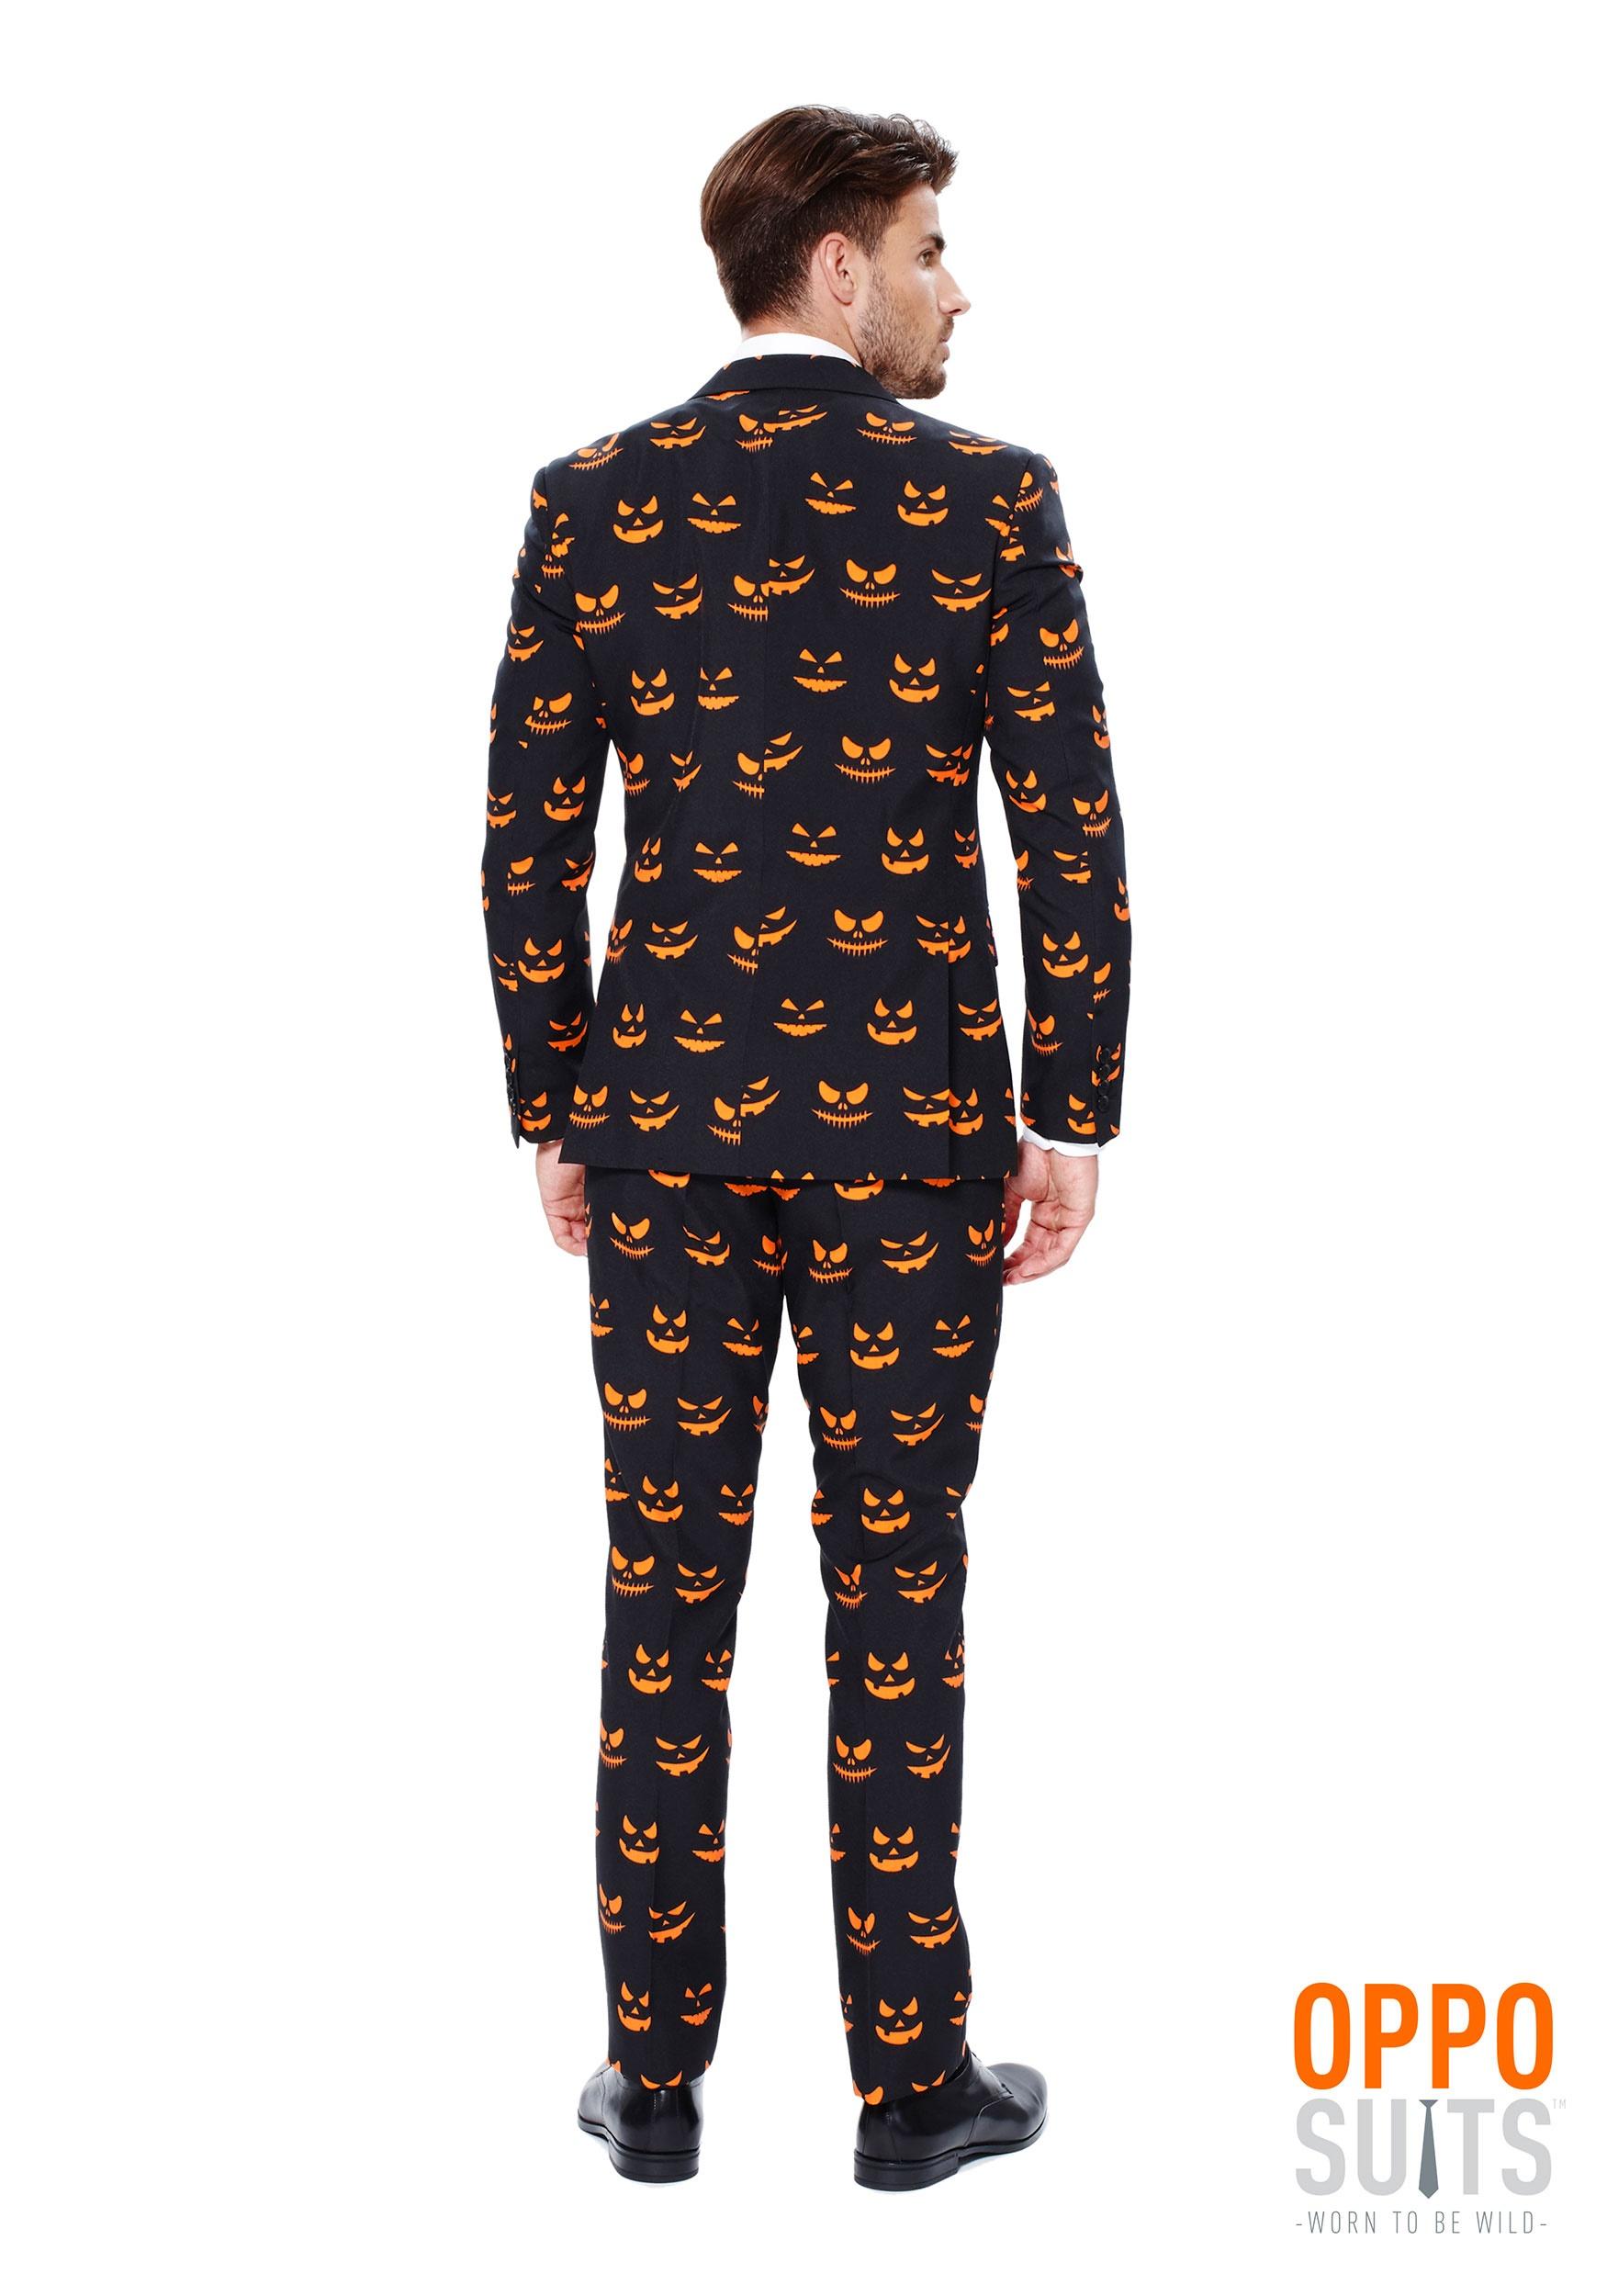 c017ec6a3f51 OppoSuits Men's Pumpkin Costume Suit